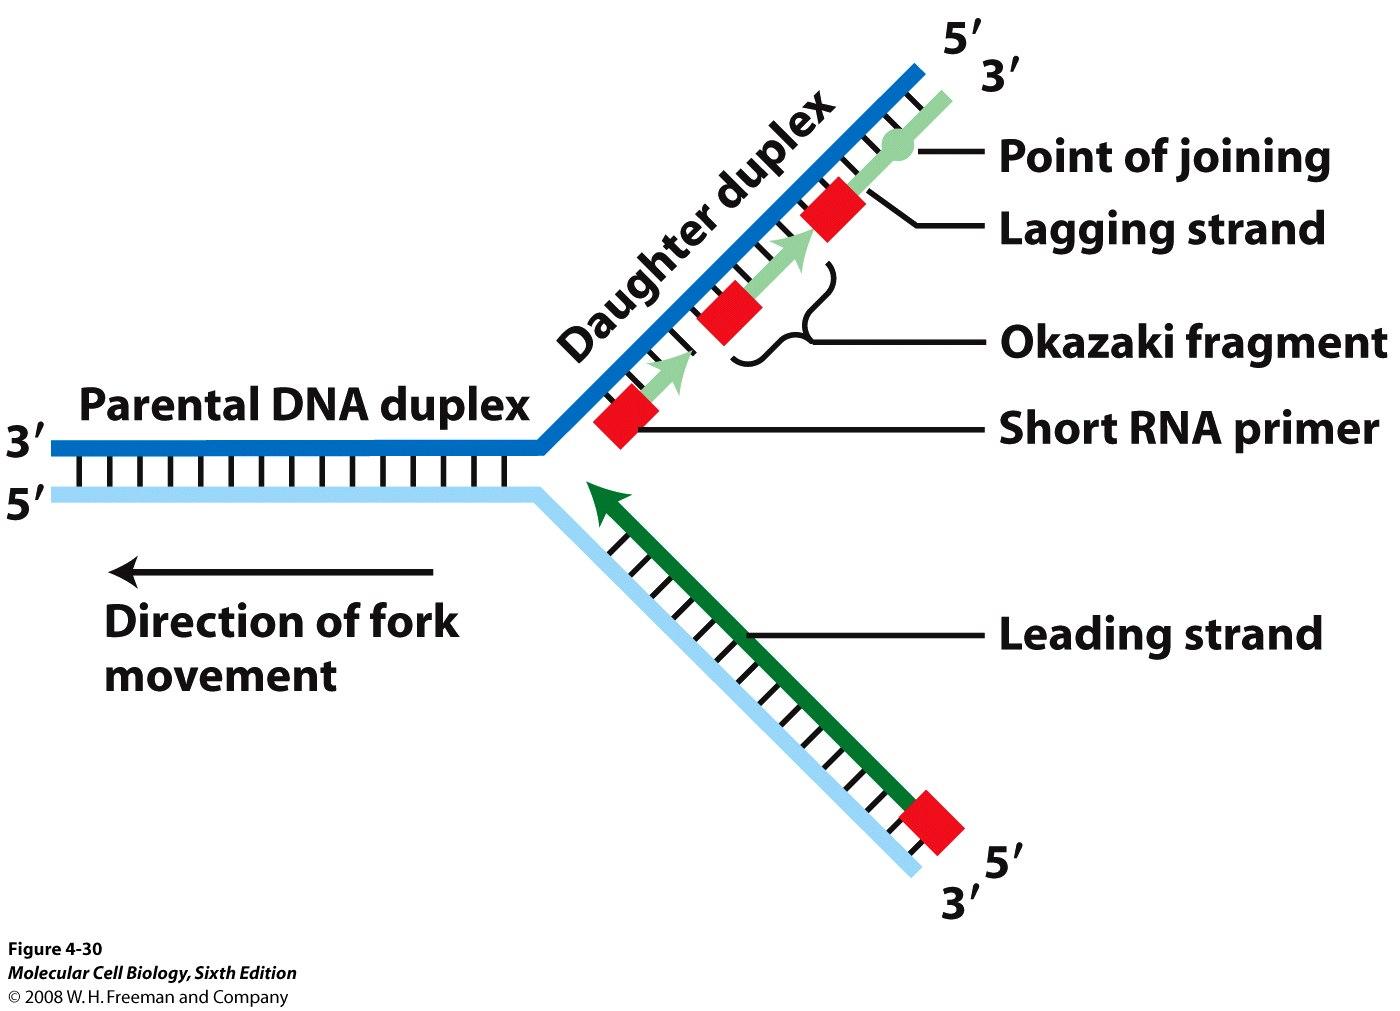 forking diagram